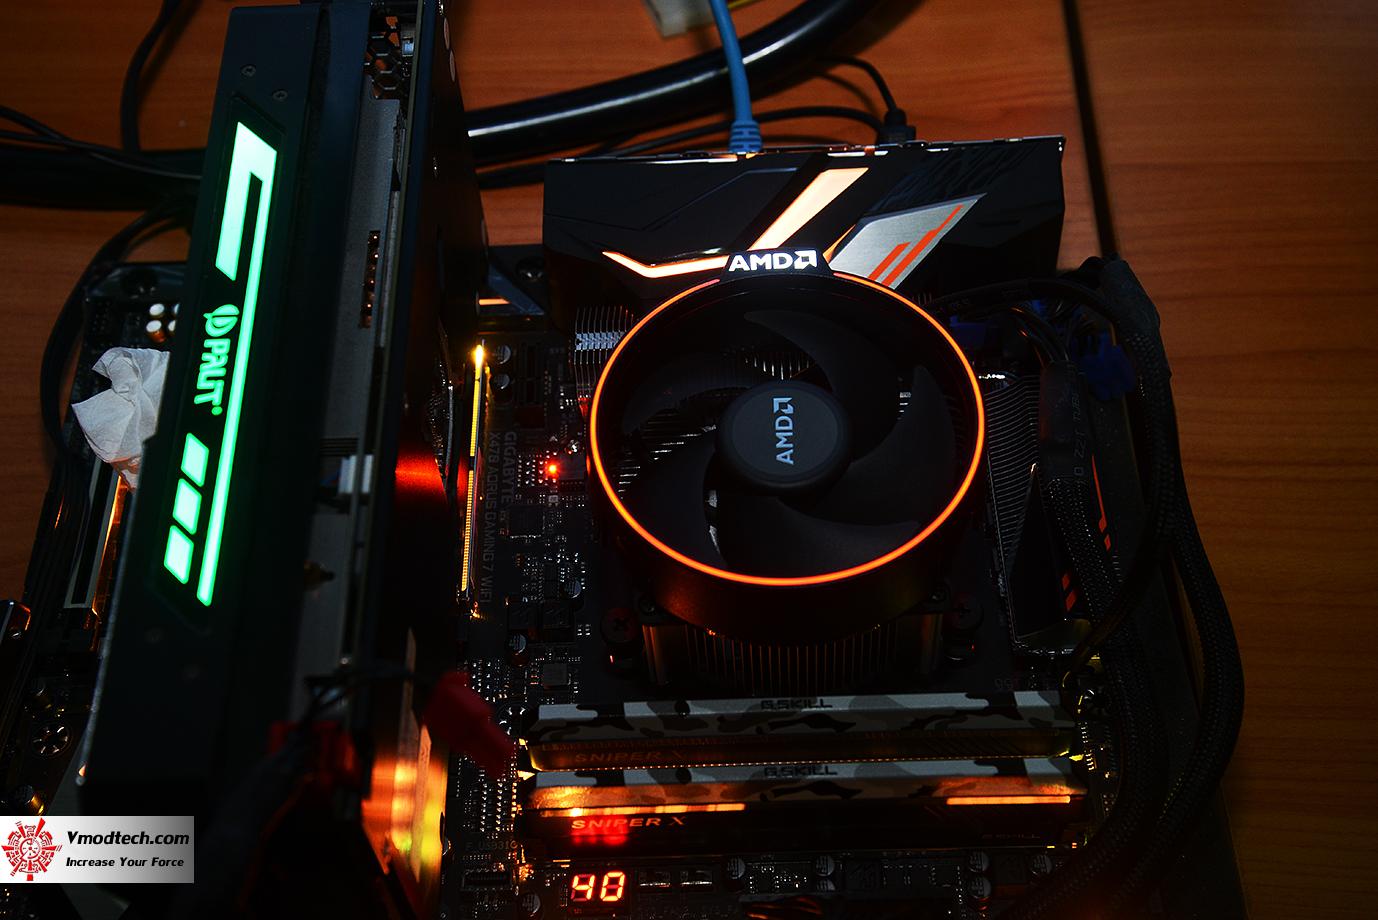 dsc 2461 AMD RYZEN 7 2700 and StoreMI Technology Review